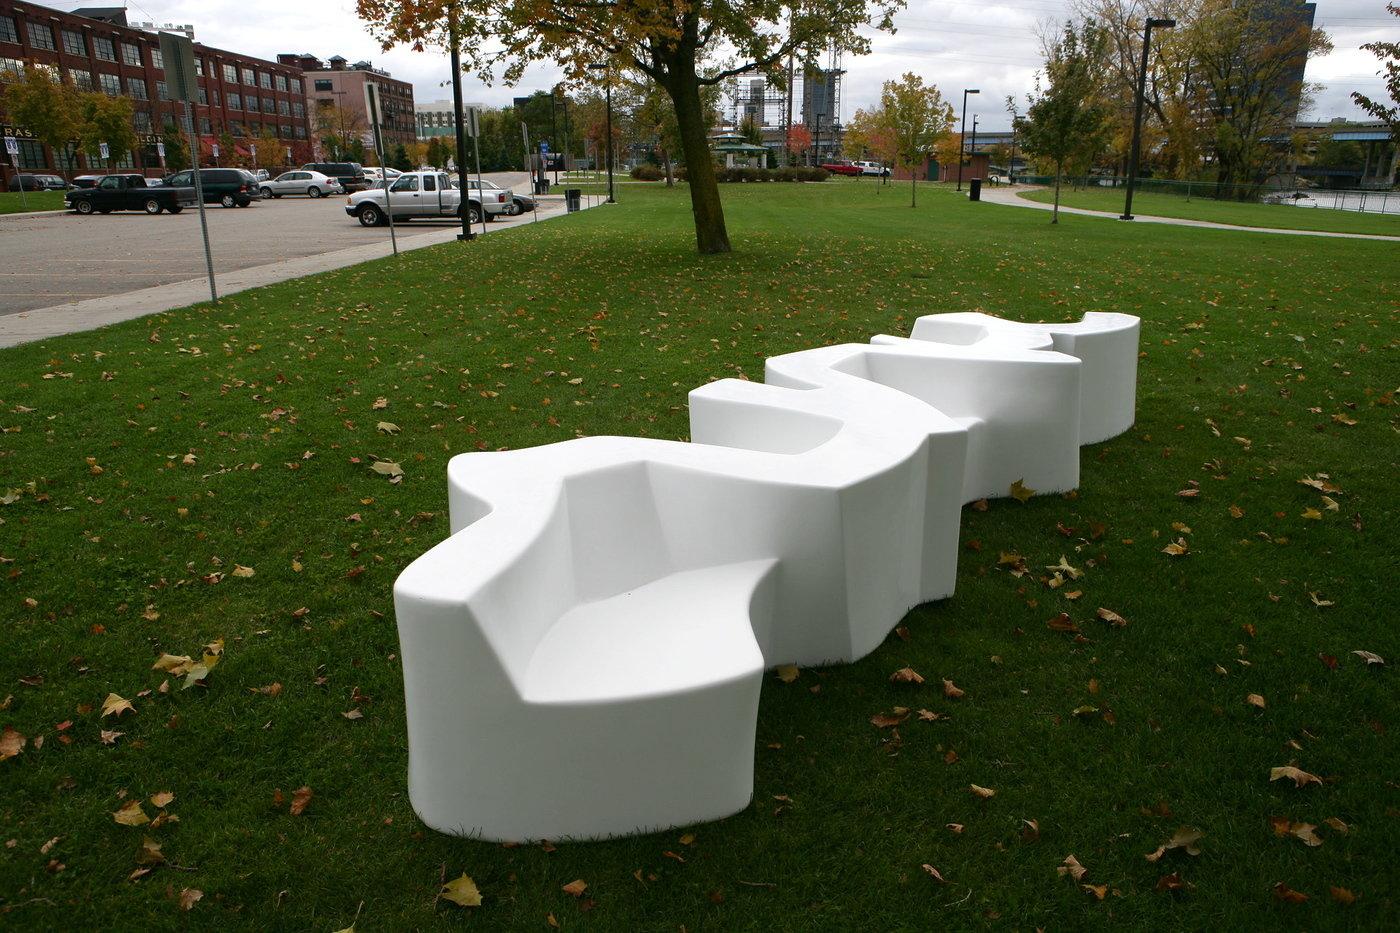 Public Furniture By Cameron Van Dyke At